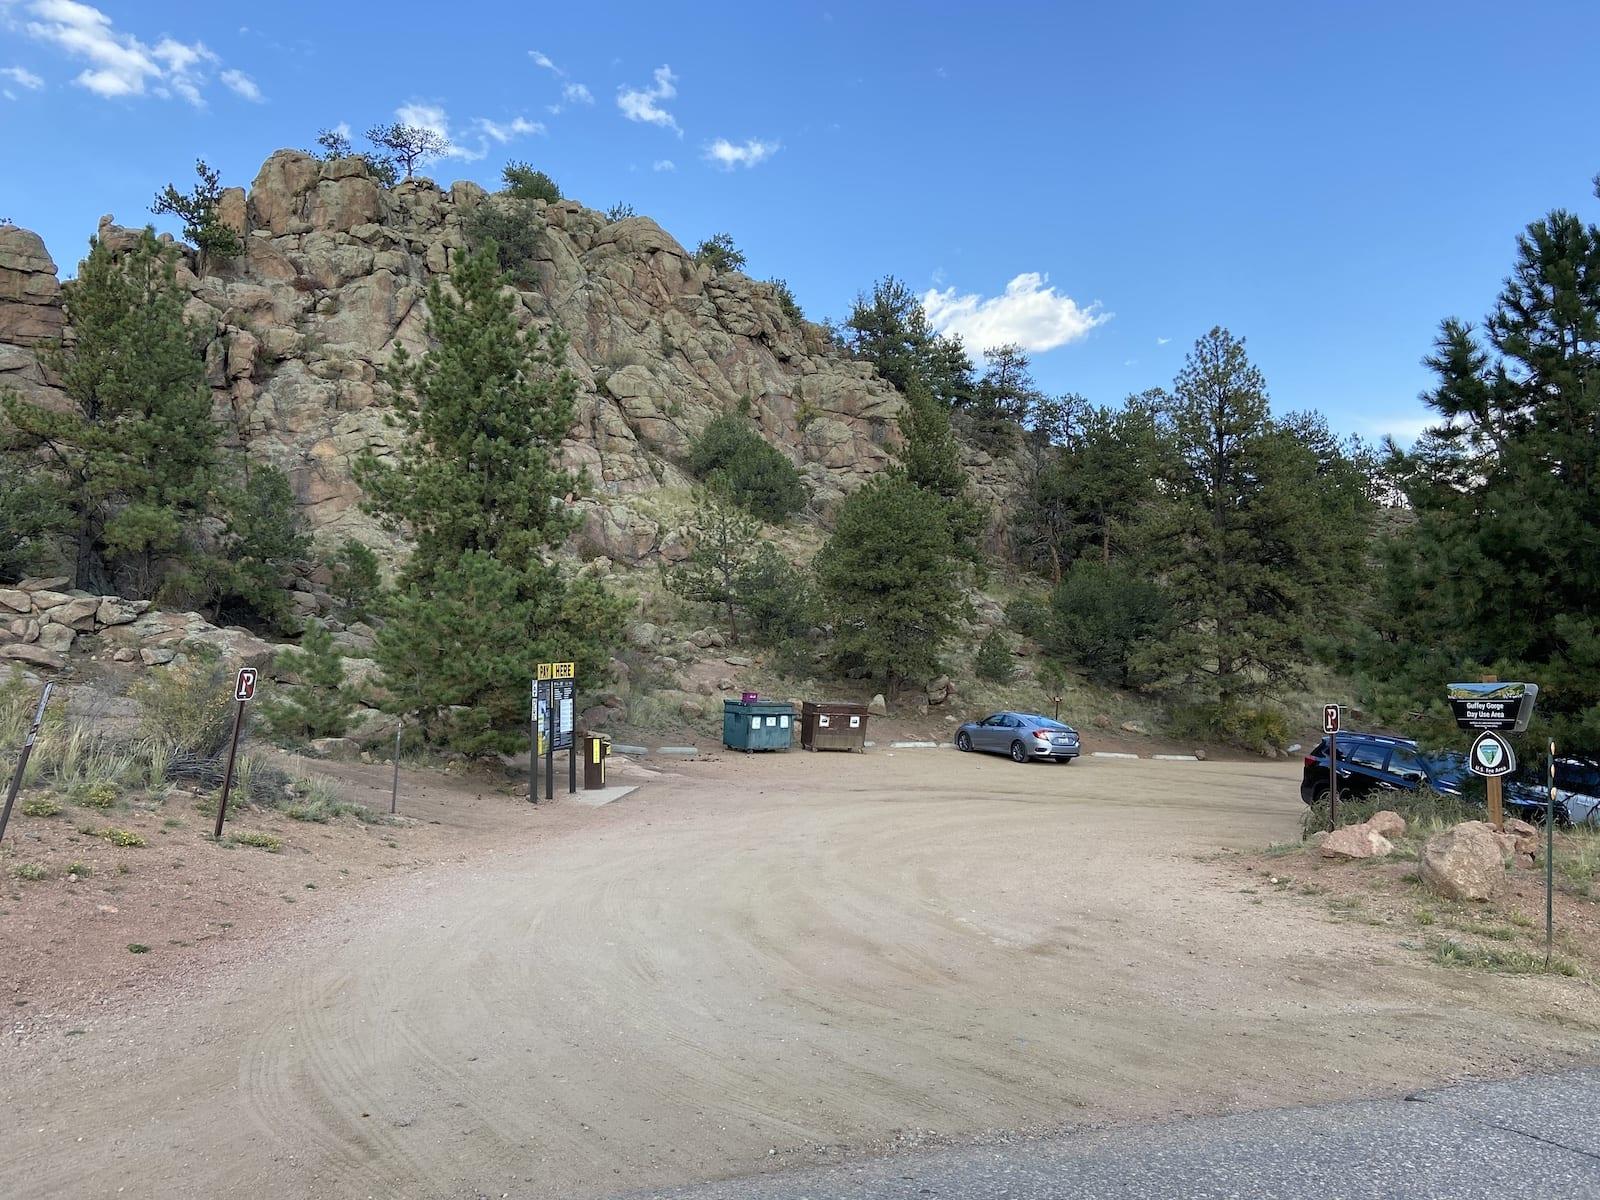 Guffey Gorge Colorado Parking Lot